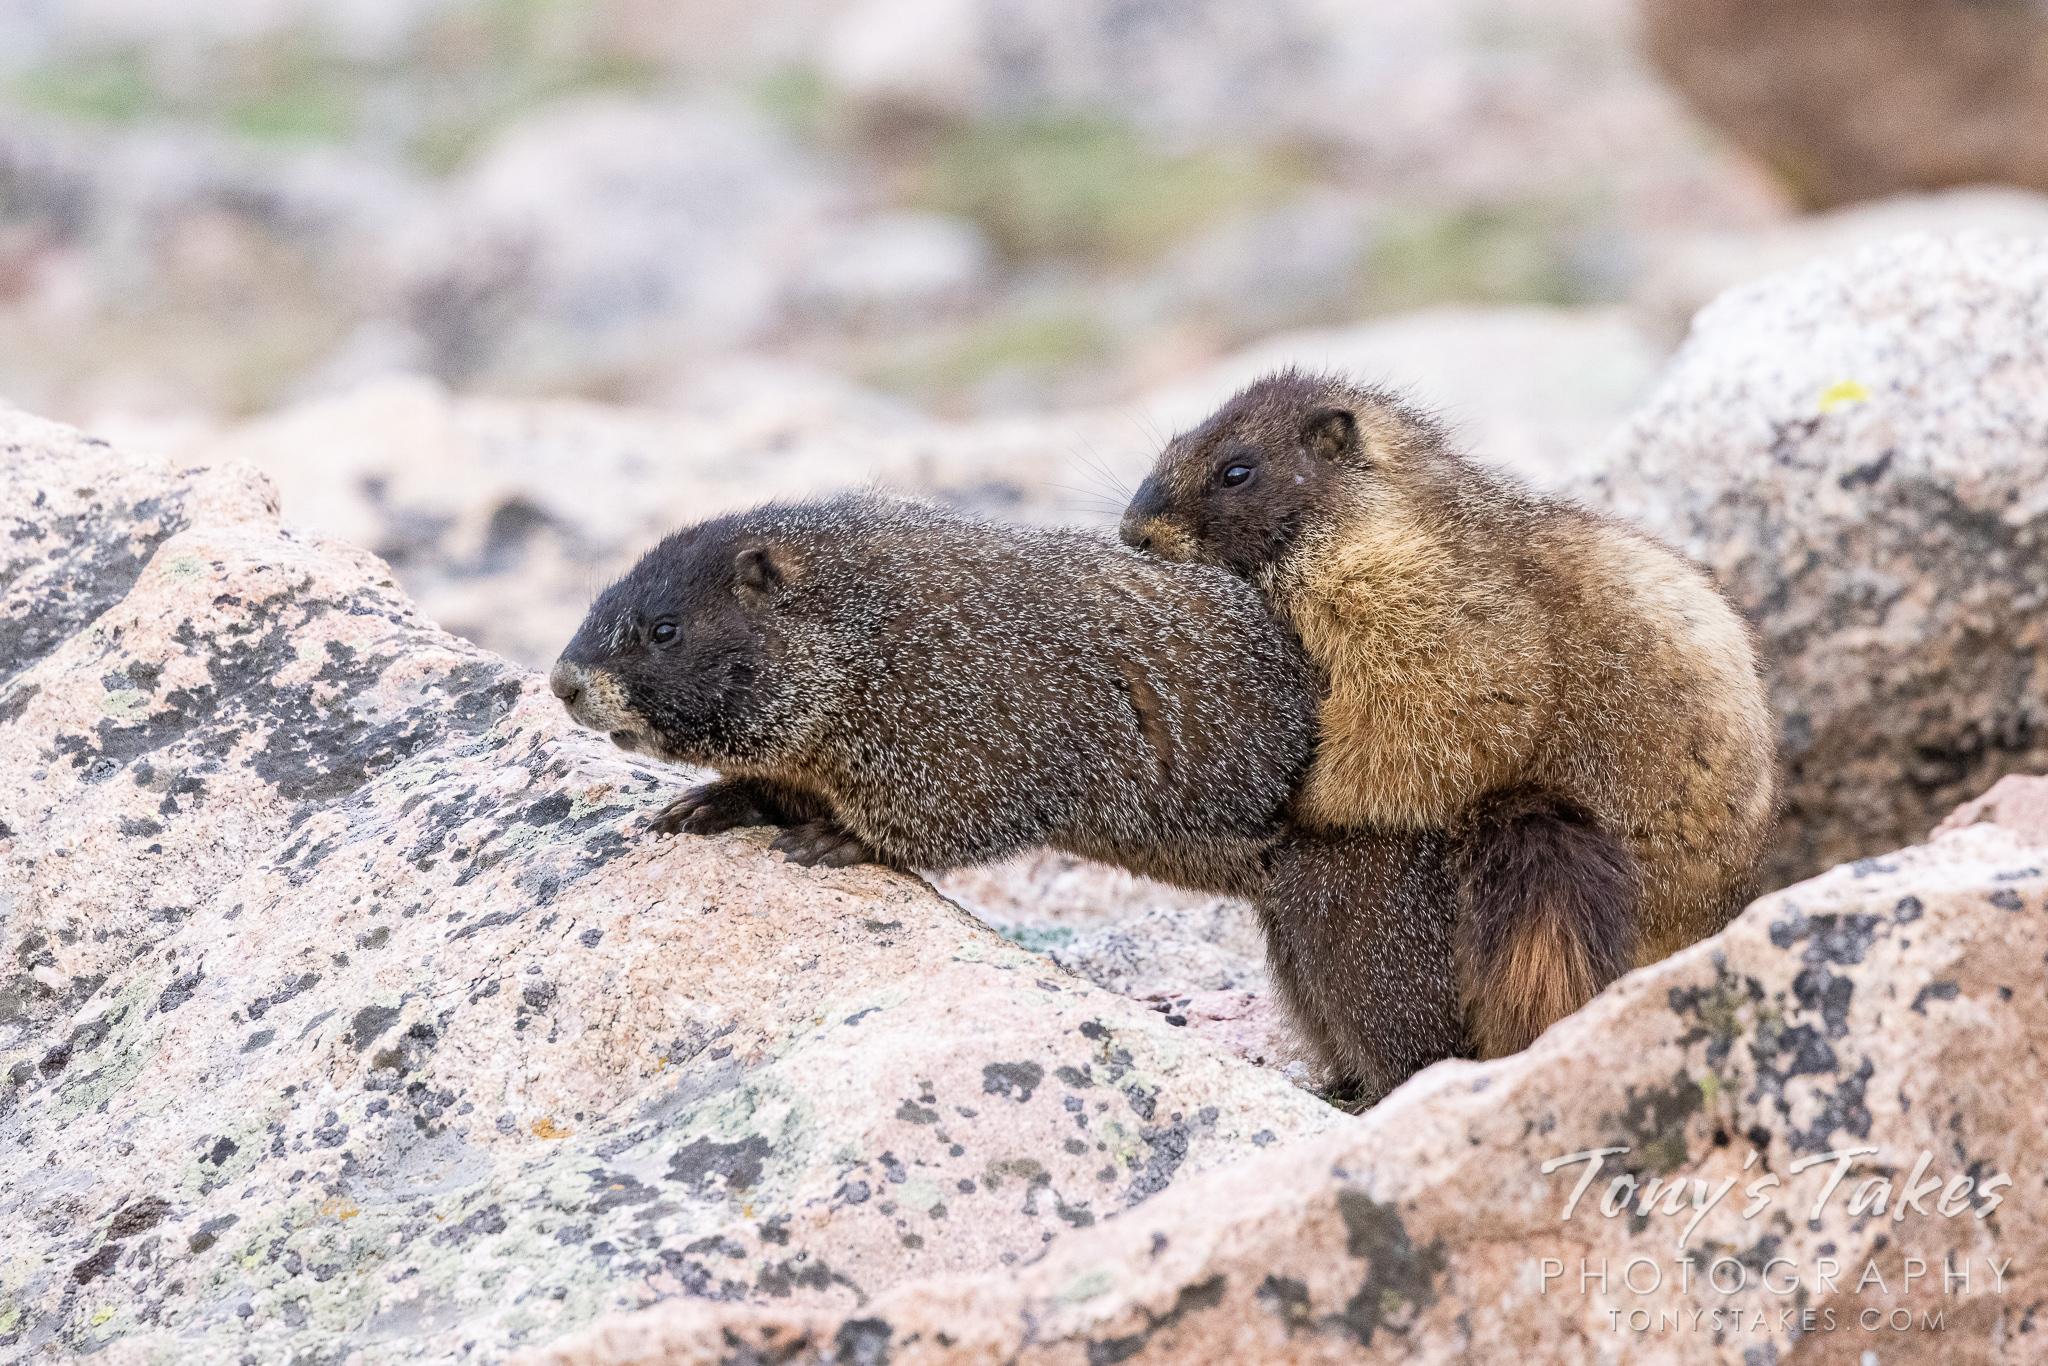 Yellow-bellied marmots work on making marmot babies